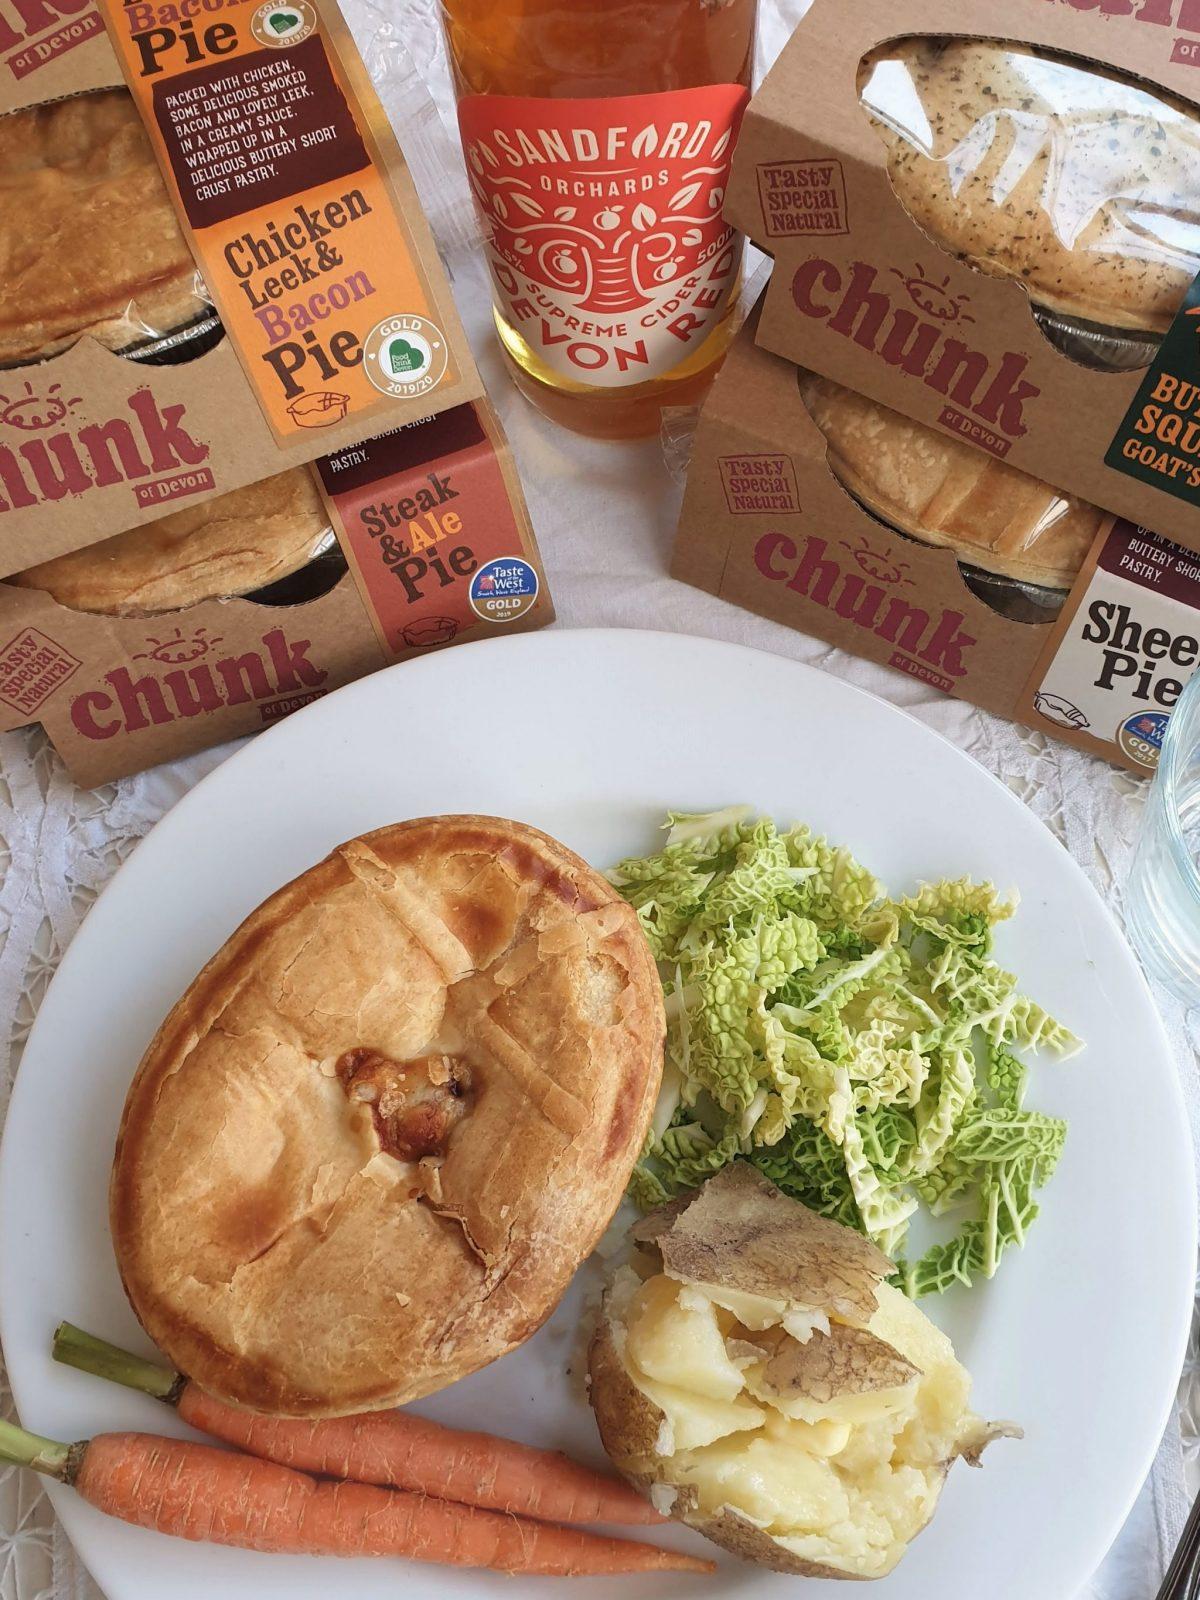 Chunk of Devon pie for lunch